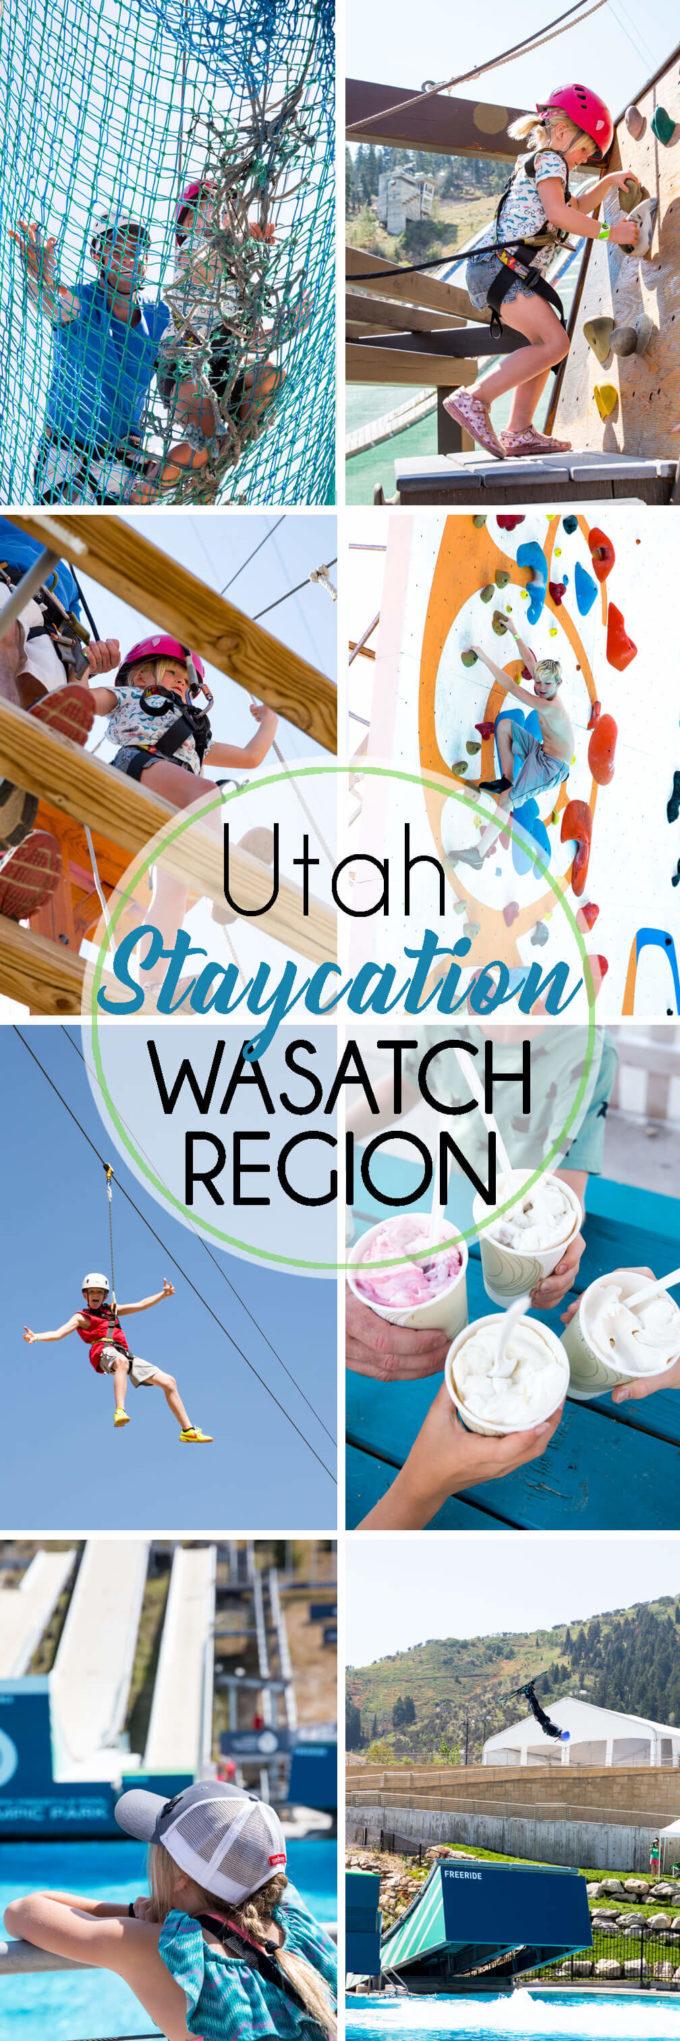 Utah Staycation wasatch region